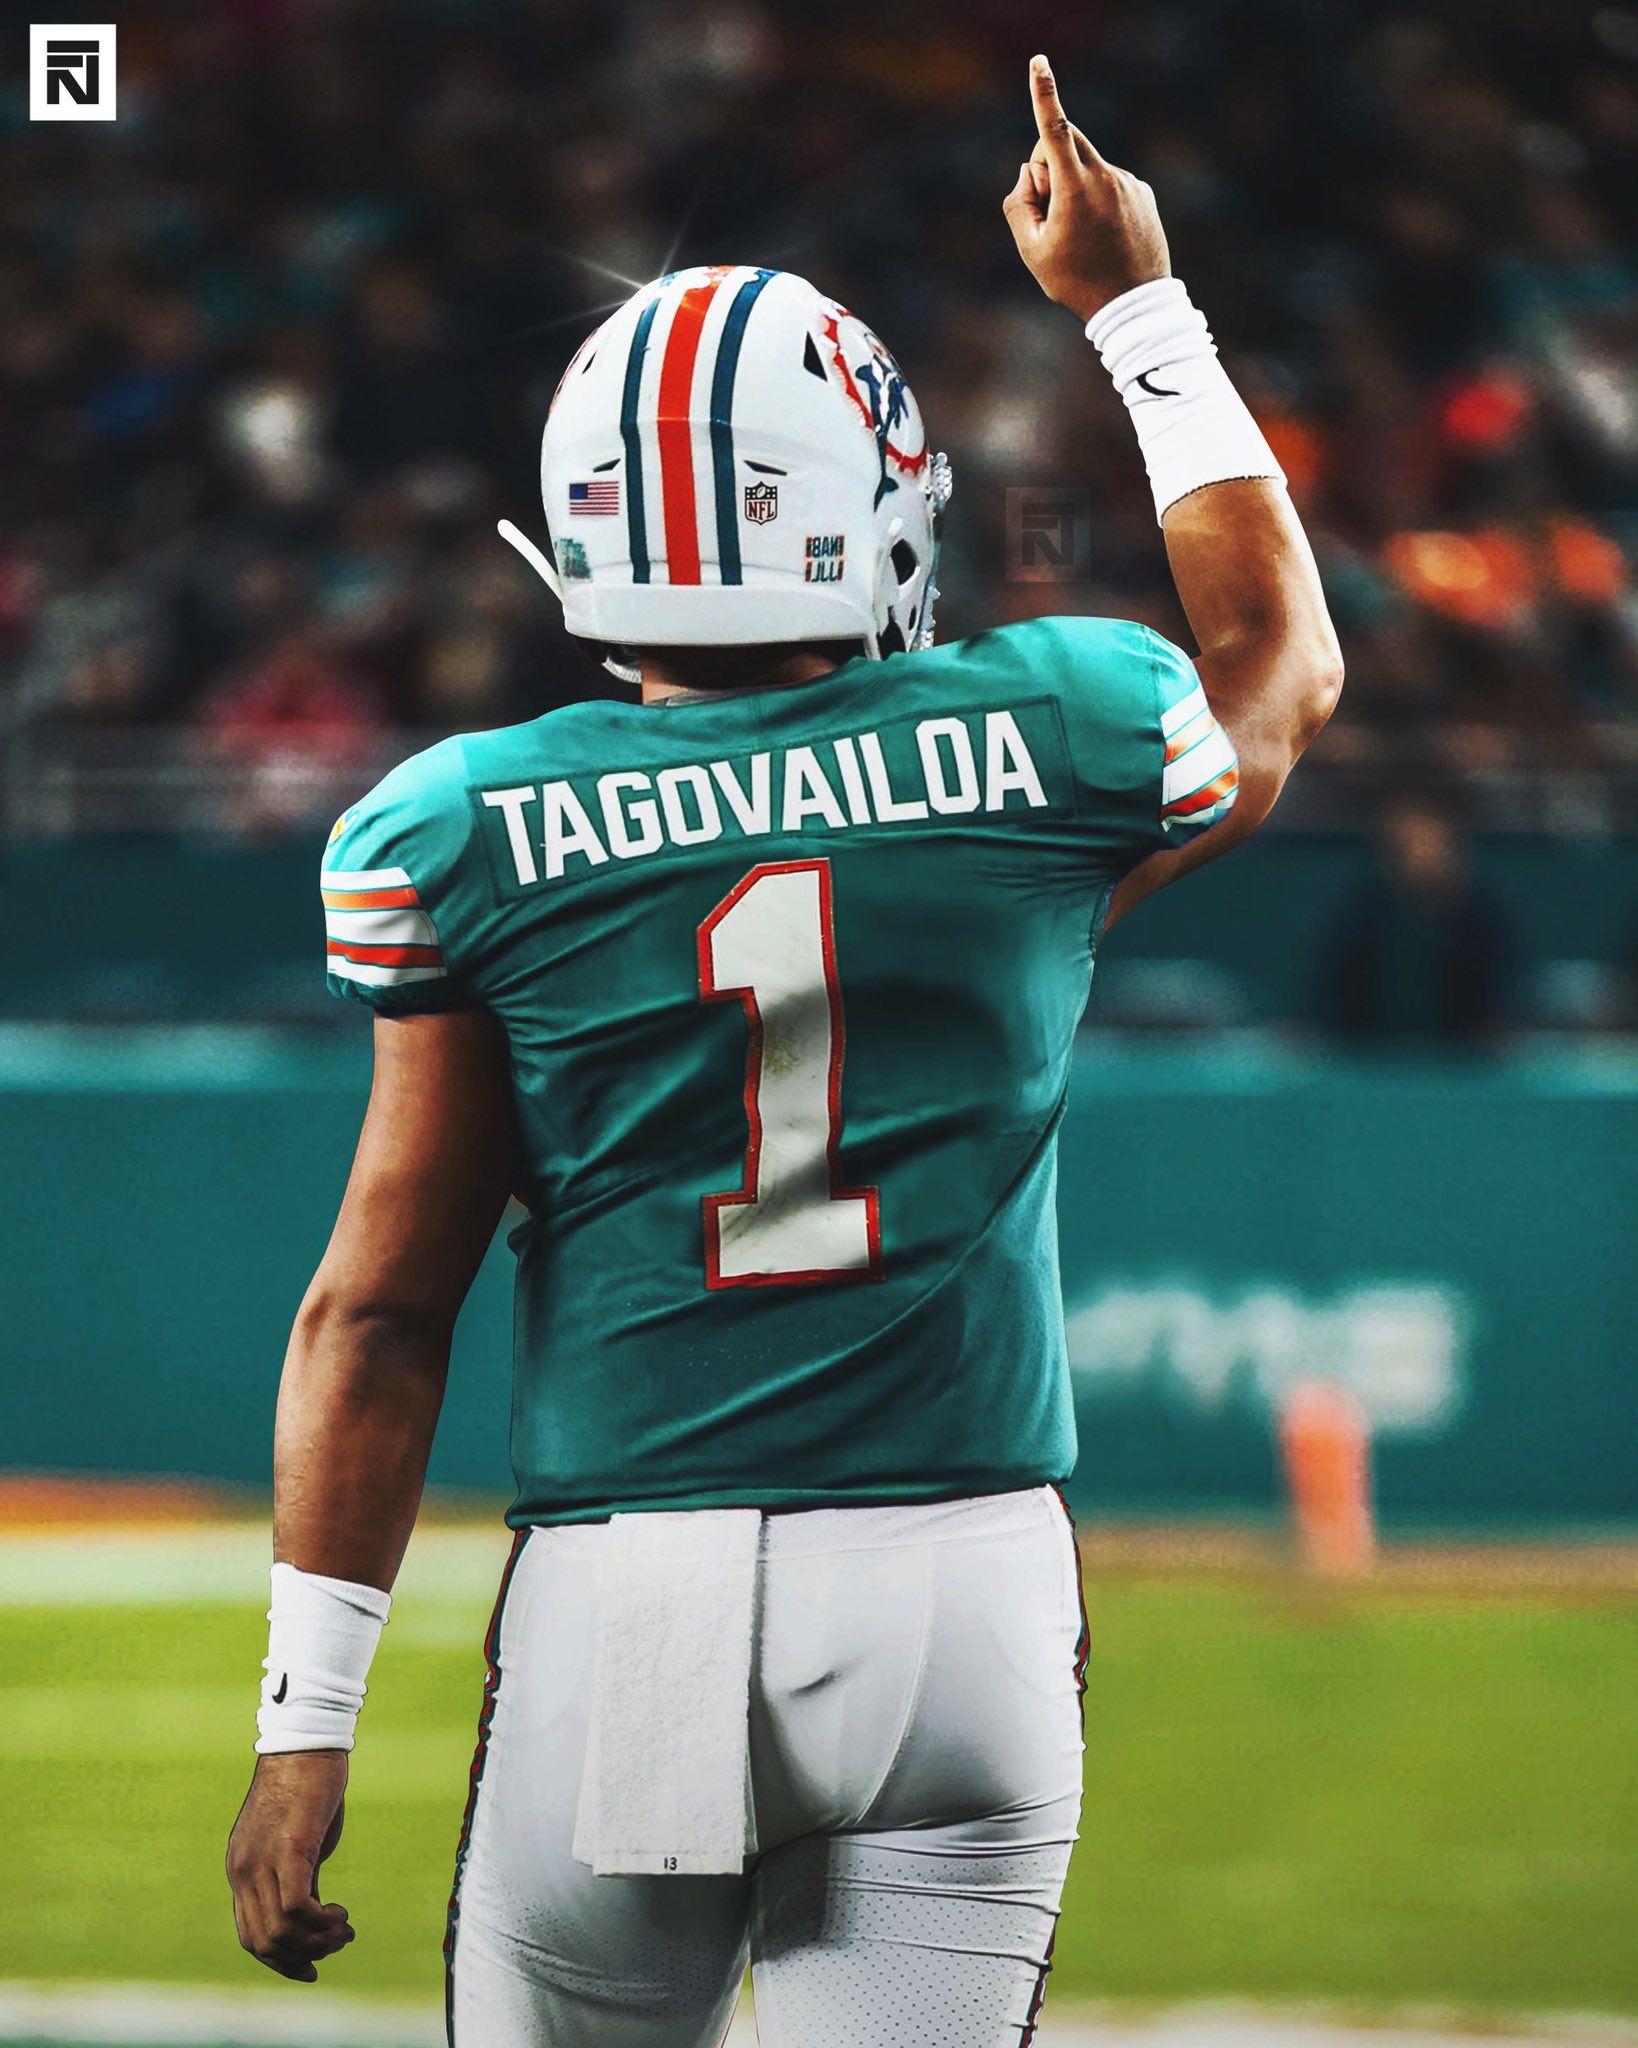 Tua As A Dolphin In 2020 Miami Dolphins Wallpaper Miami Dolphins Football Miami Dolphins